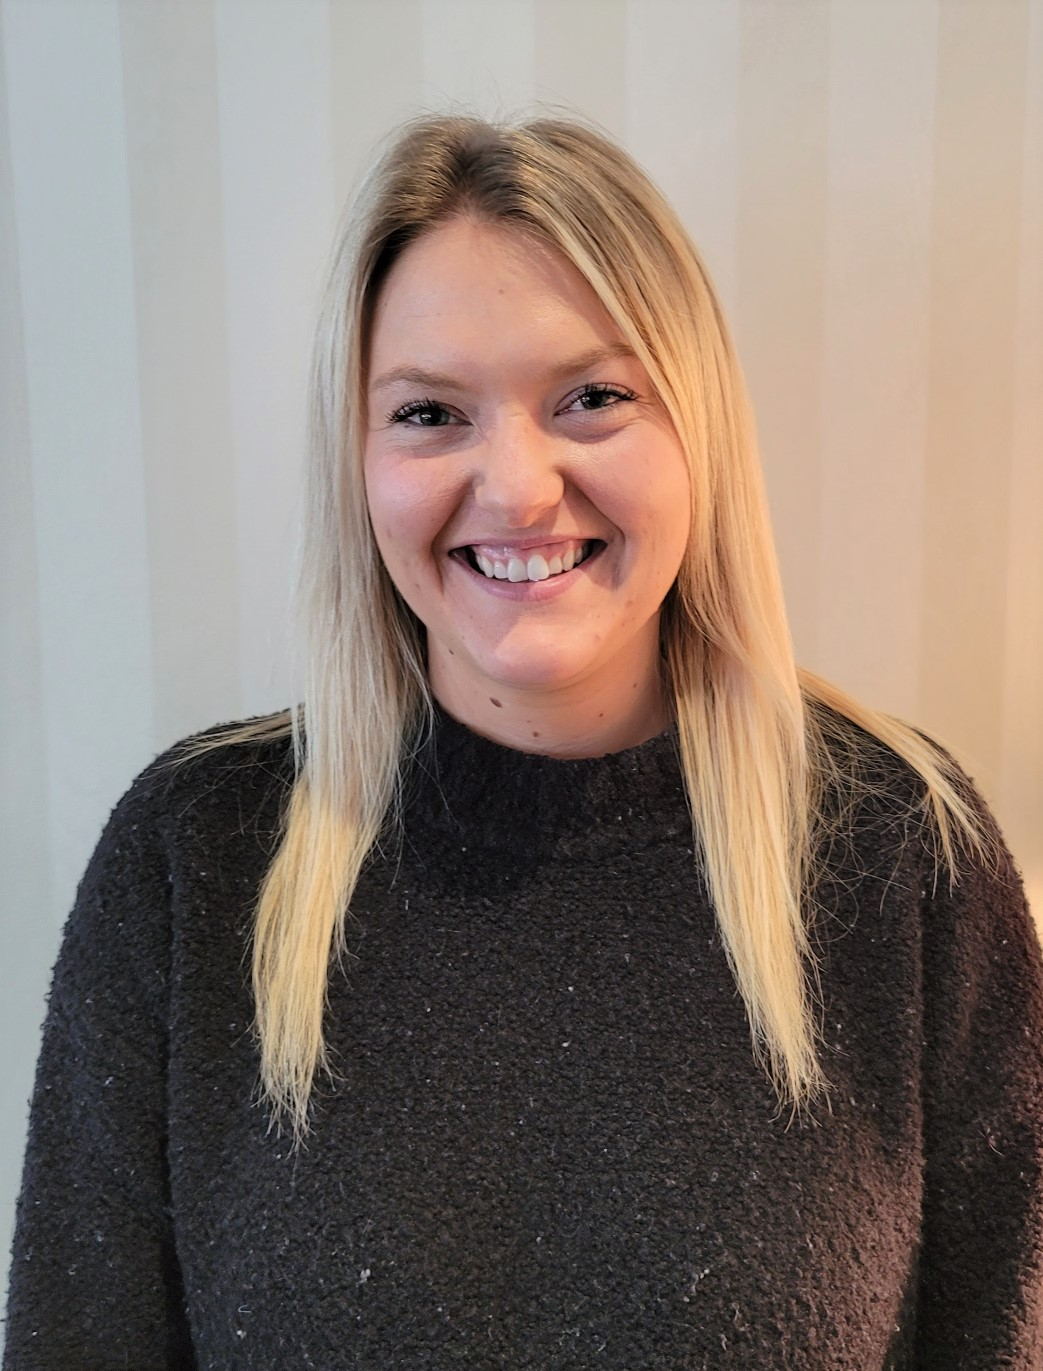 Photo of Allison Diebus, new marketing and customer engagement coordinator